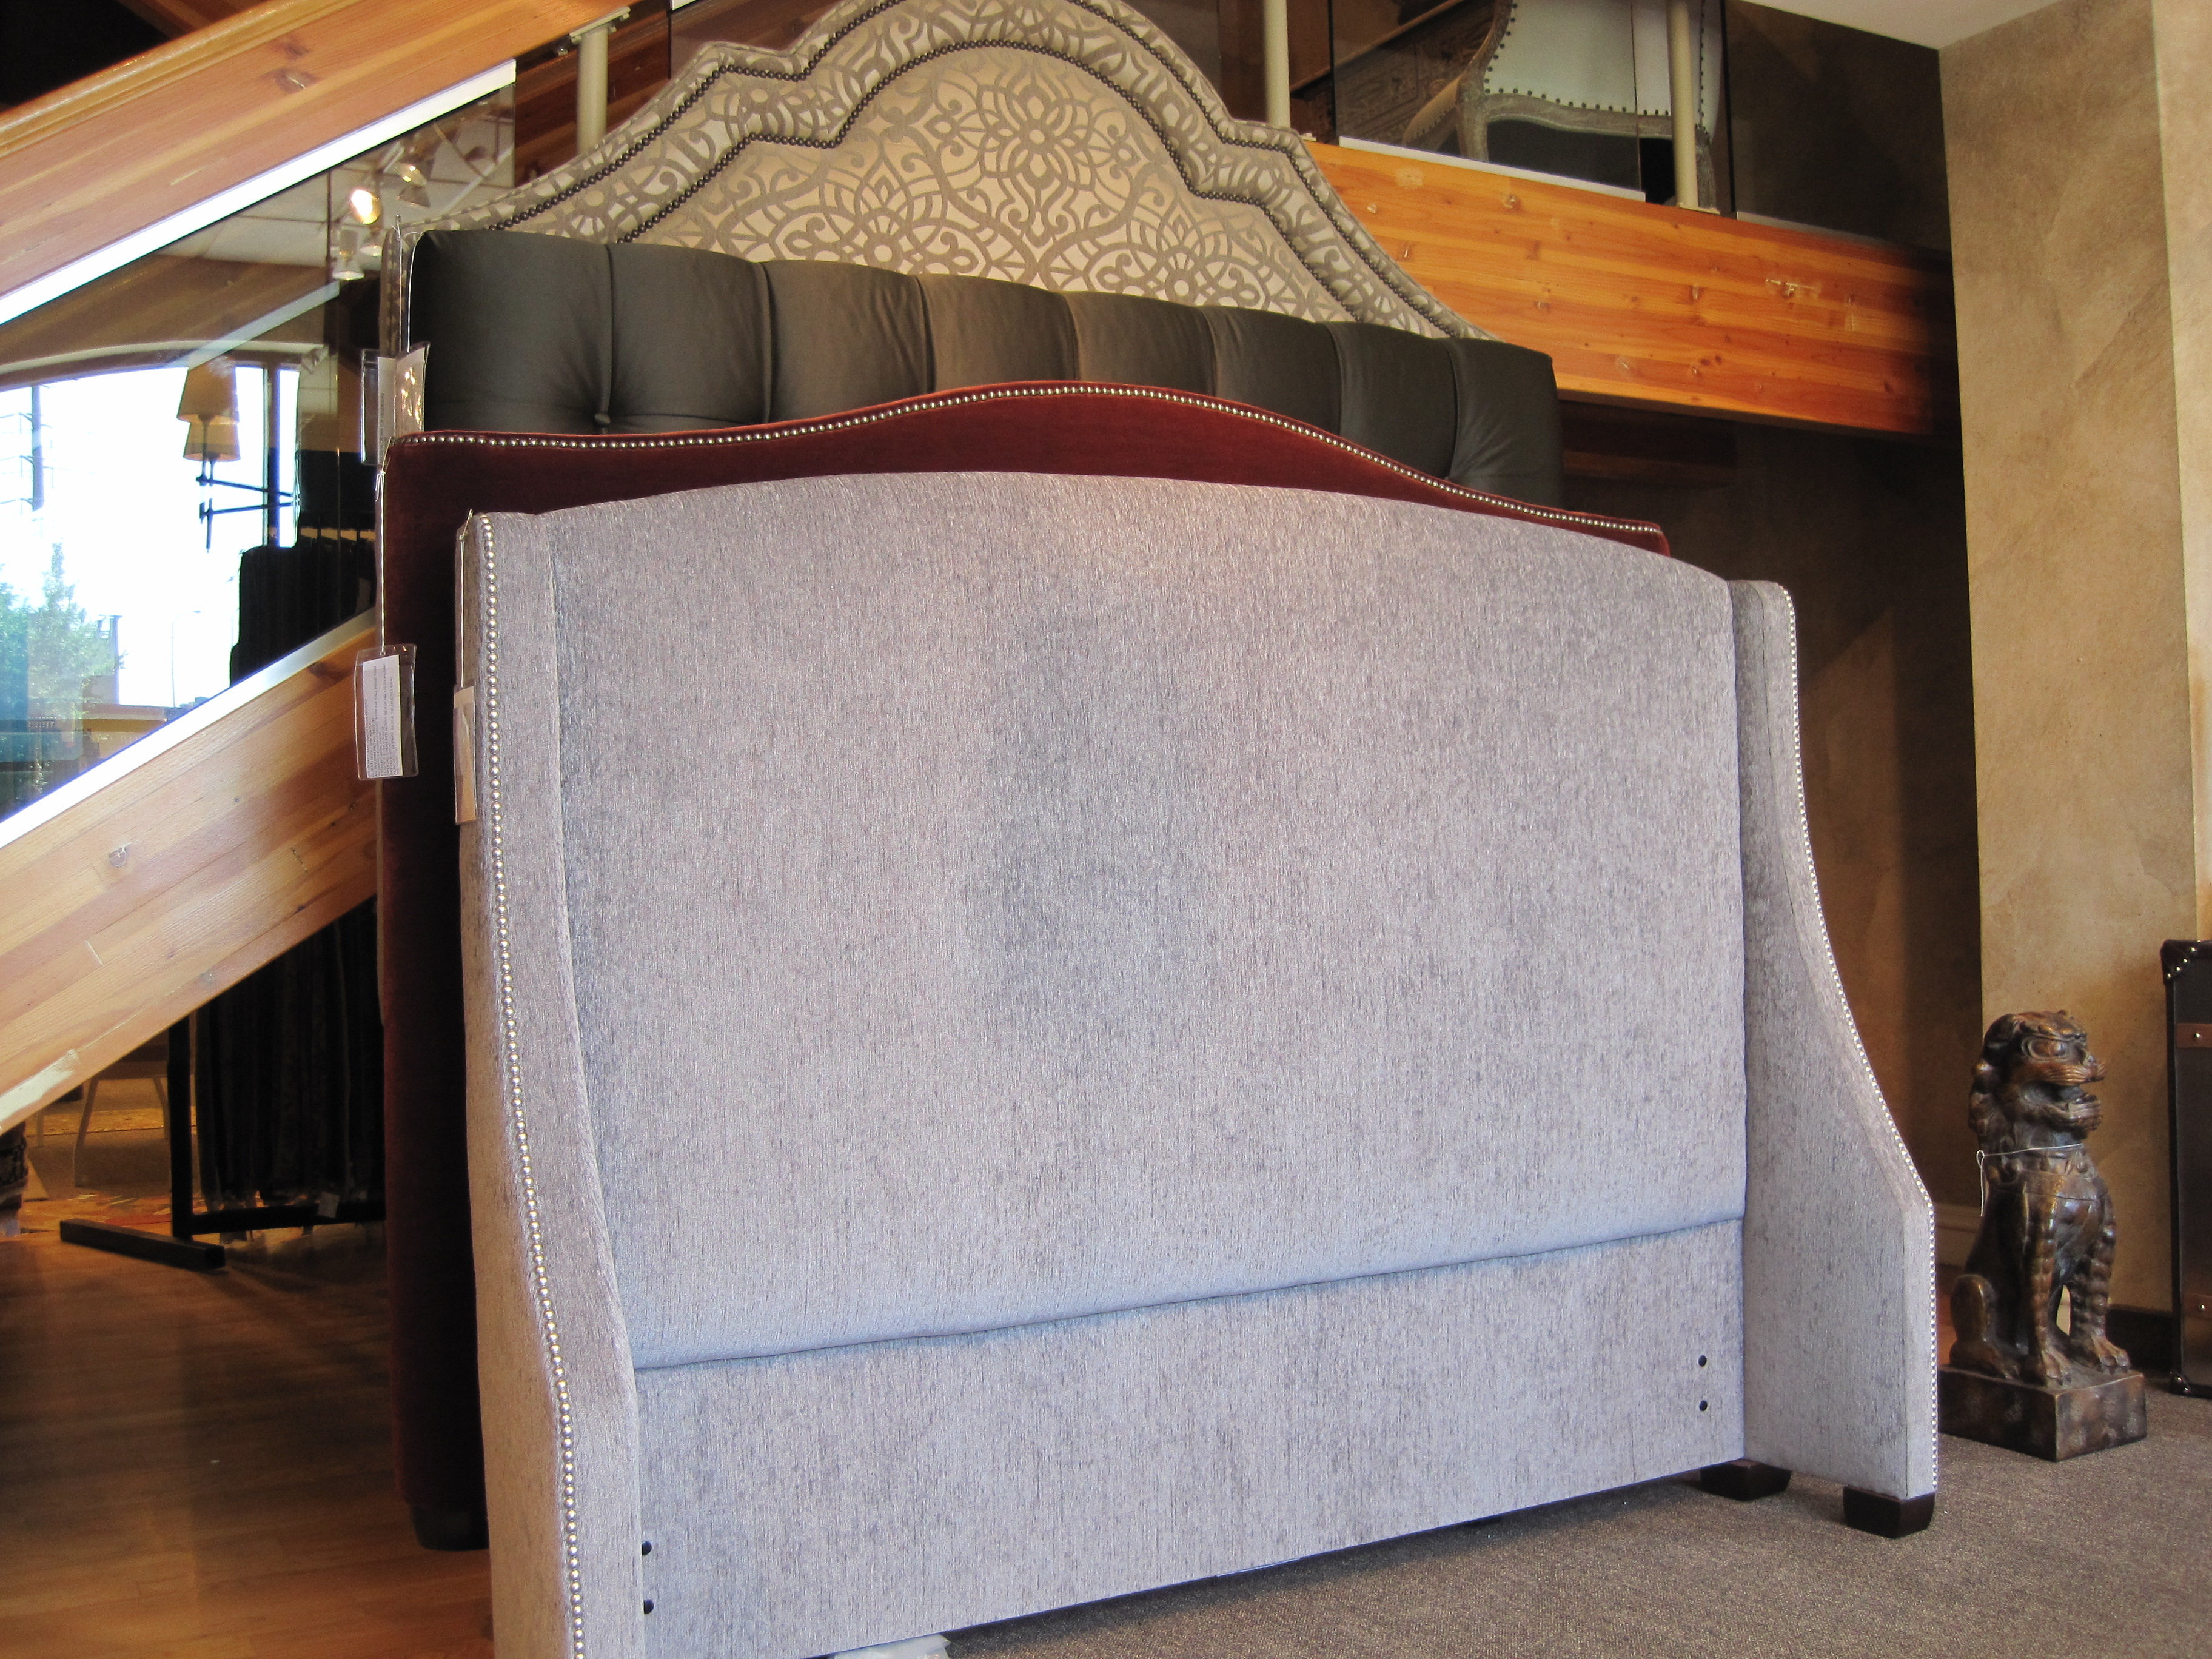 Should Nightstands Match Bed